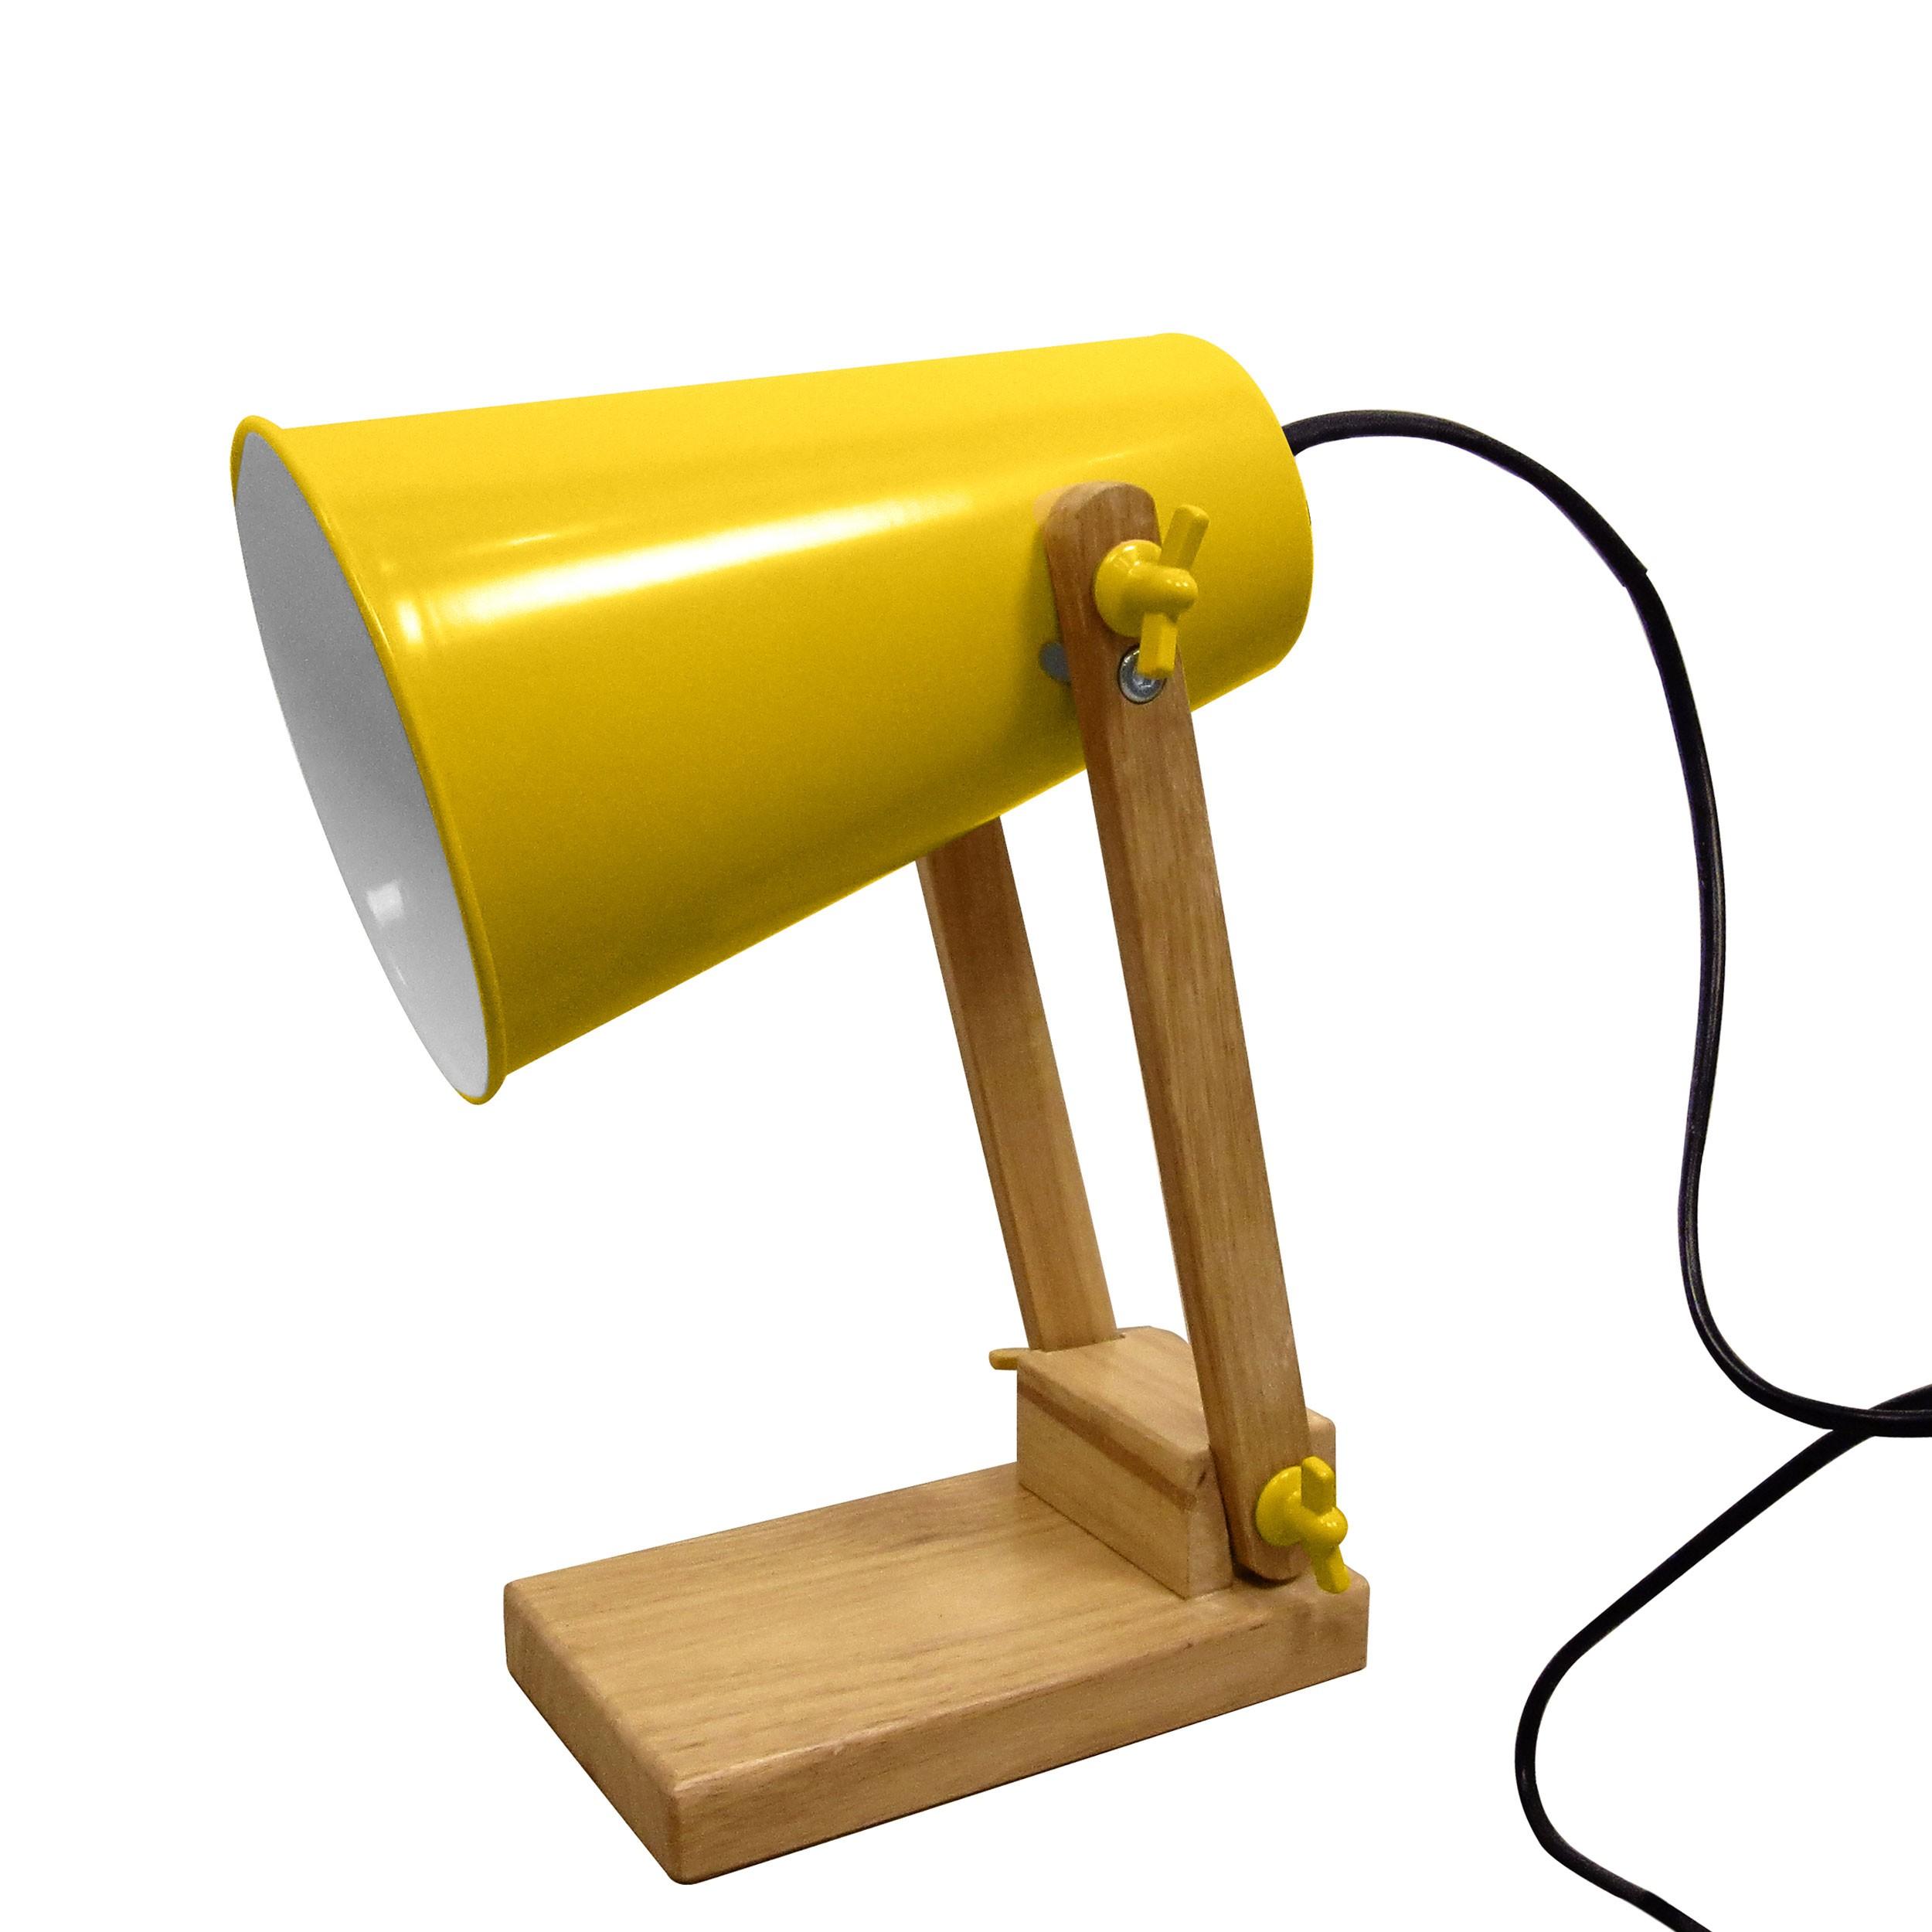 Lampe De Bureau Ino Jaune Installez Nos Lampes De Bureau Ino